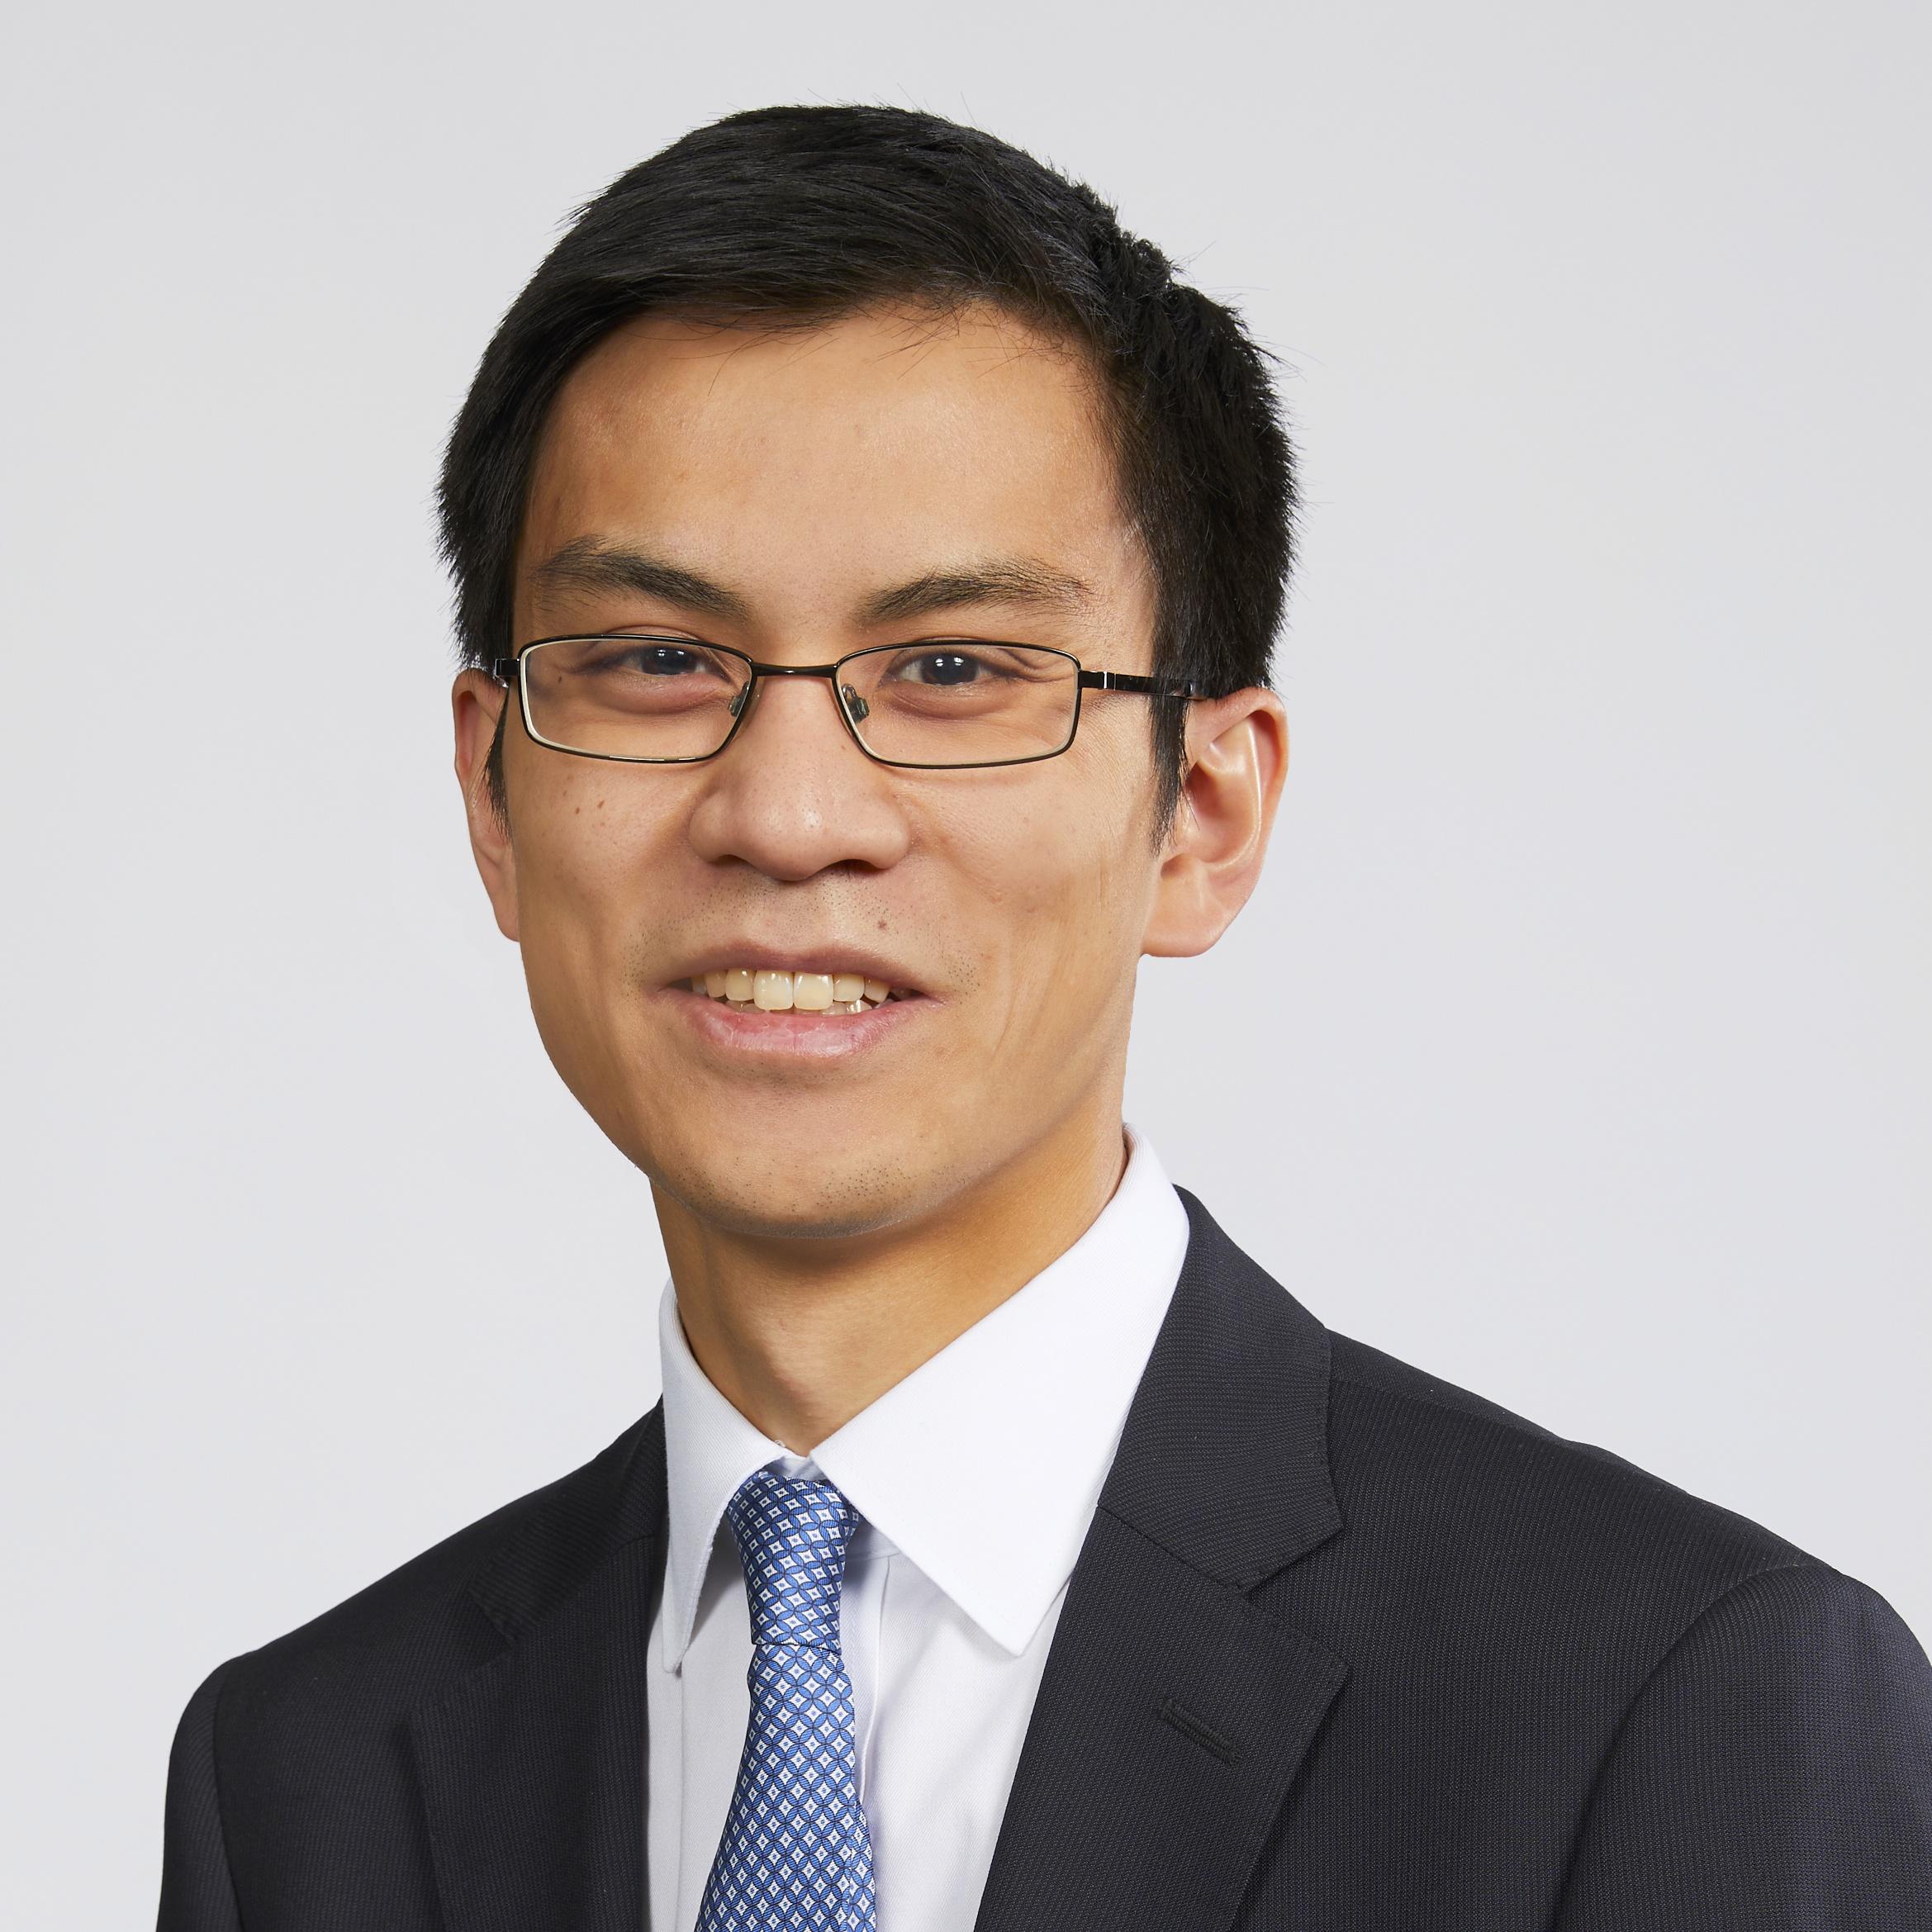 Minh-Quan  Nguyen,  BA, DipLang, JD (Melb); BCL (Dist) (Oxon)